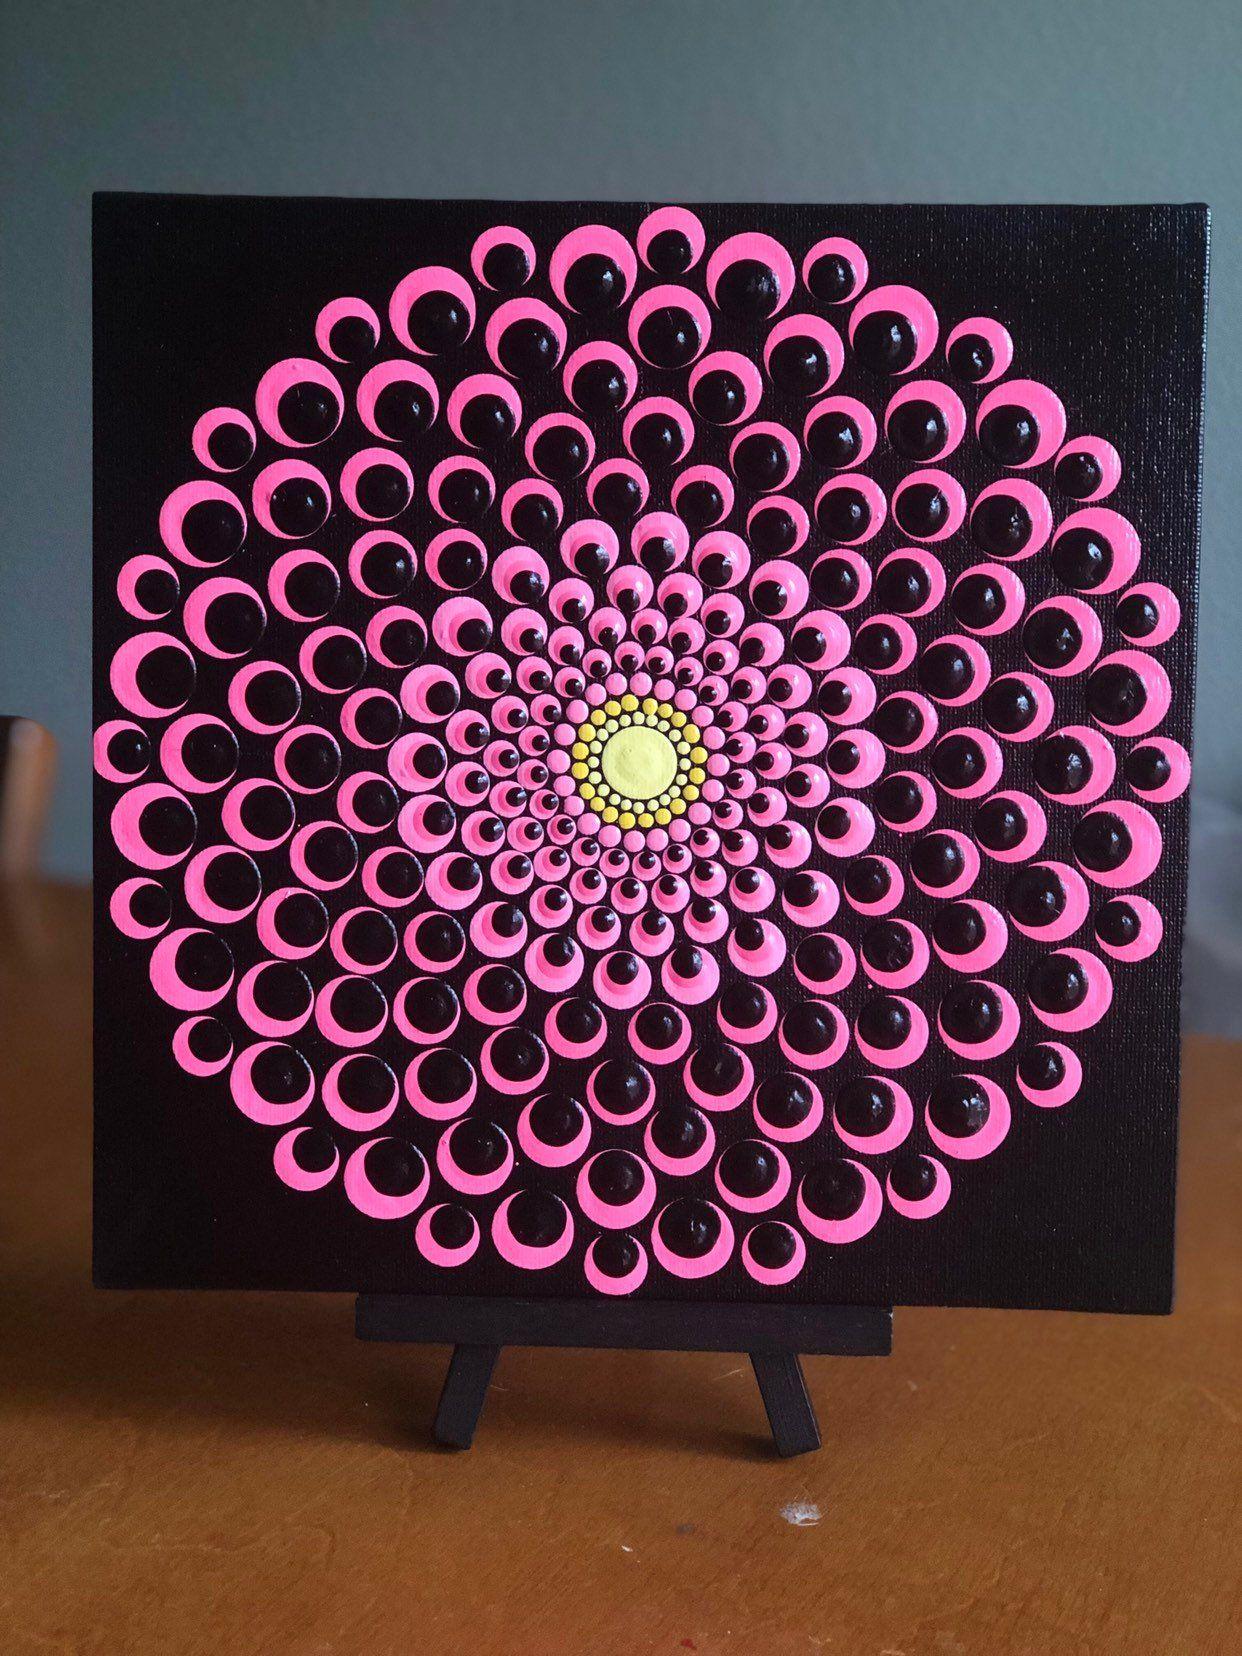 Blooming Dahlia Dot Mandala On Canvas Board 8 X 8 Pink Black Yellow Mandala Rock Art Dot Art Painting Mandala Canvas